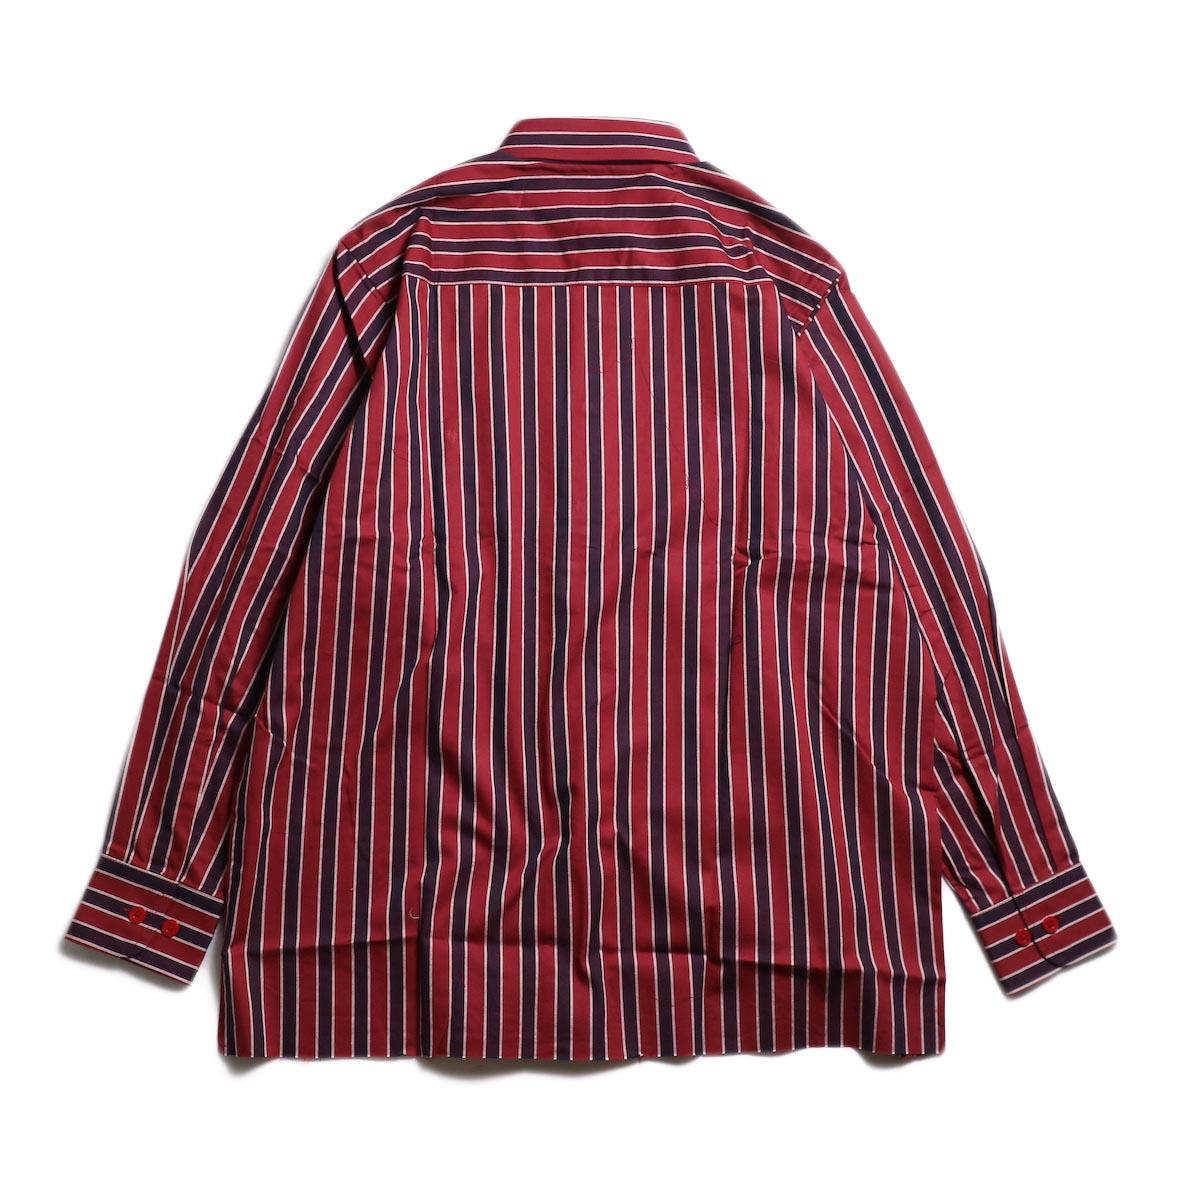 Needles / Cut-Off Bottom Regular Collar Shirt -Cotton Twill Stripe (Red) 背面